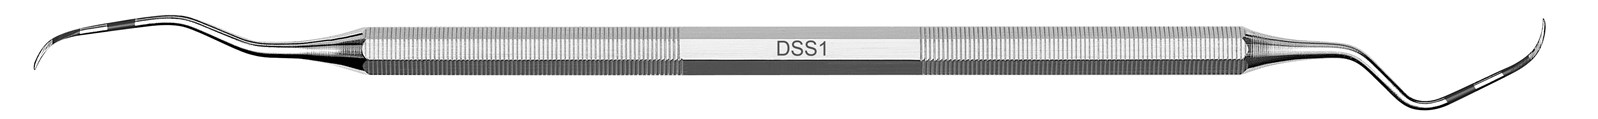 Kyreta Deppeler smart scaling (DSS) - DSS1, ADEP růžový